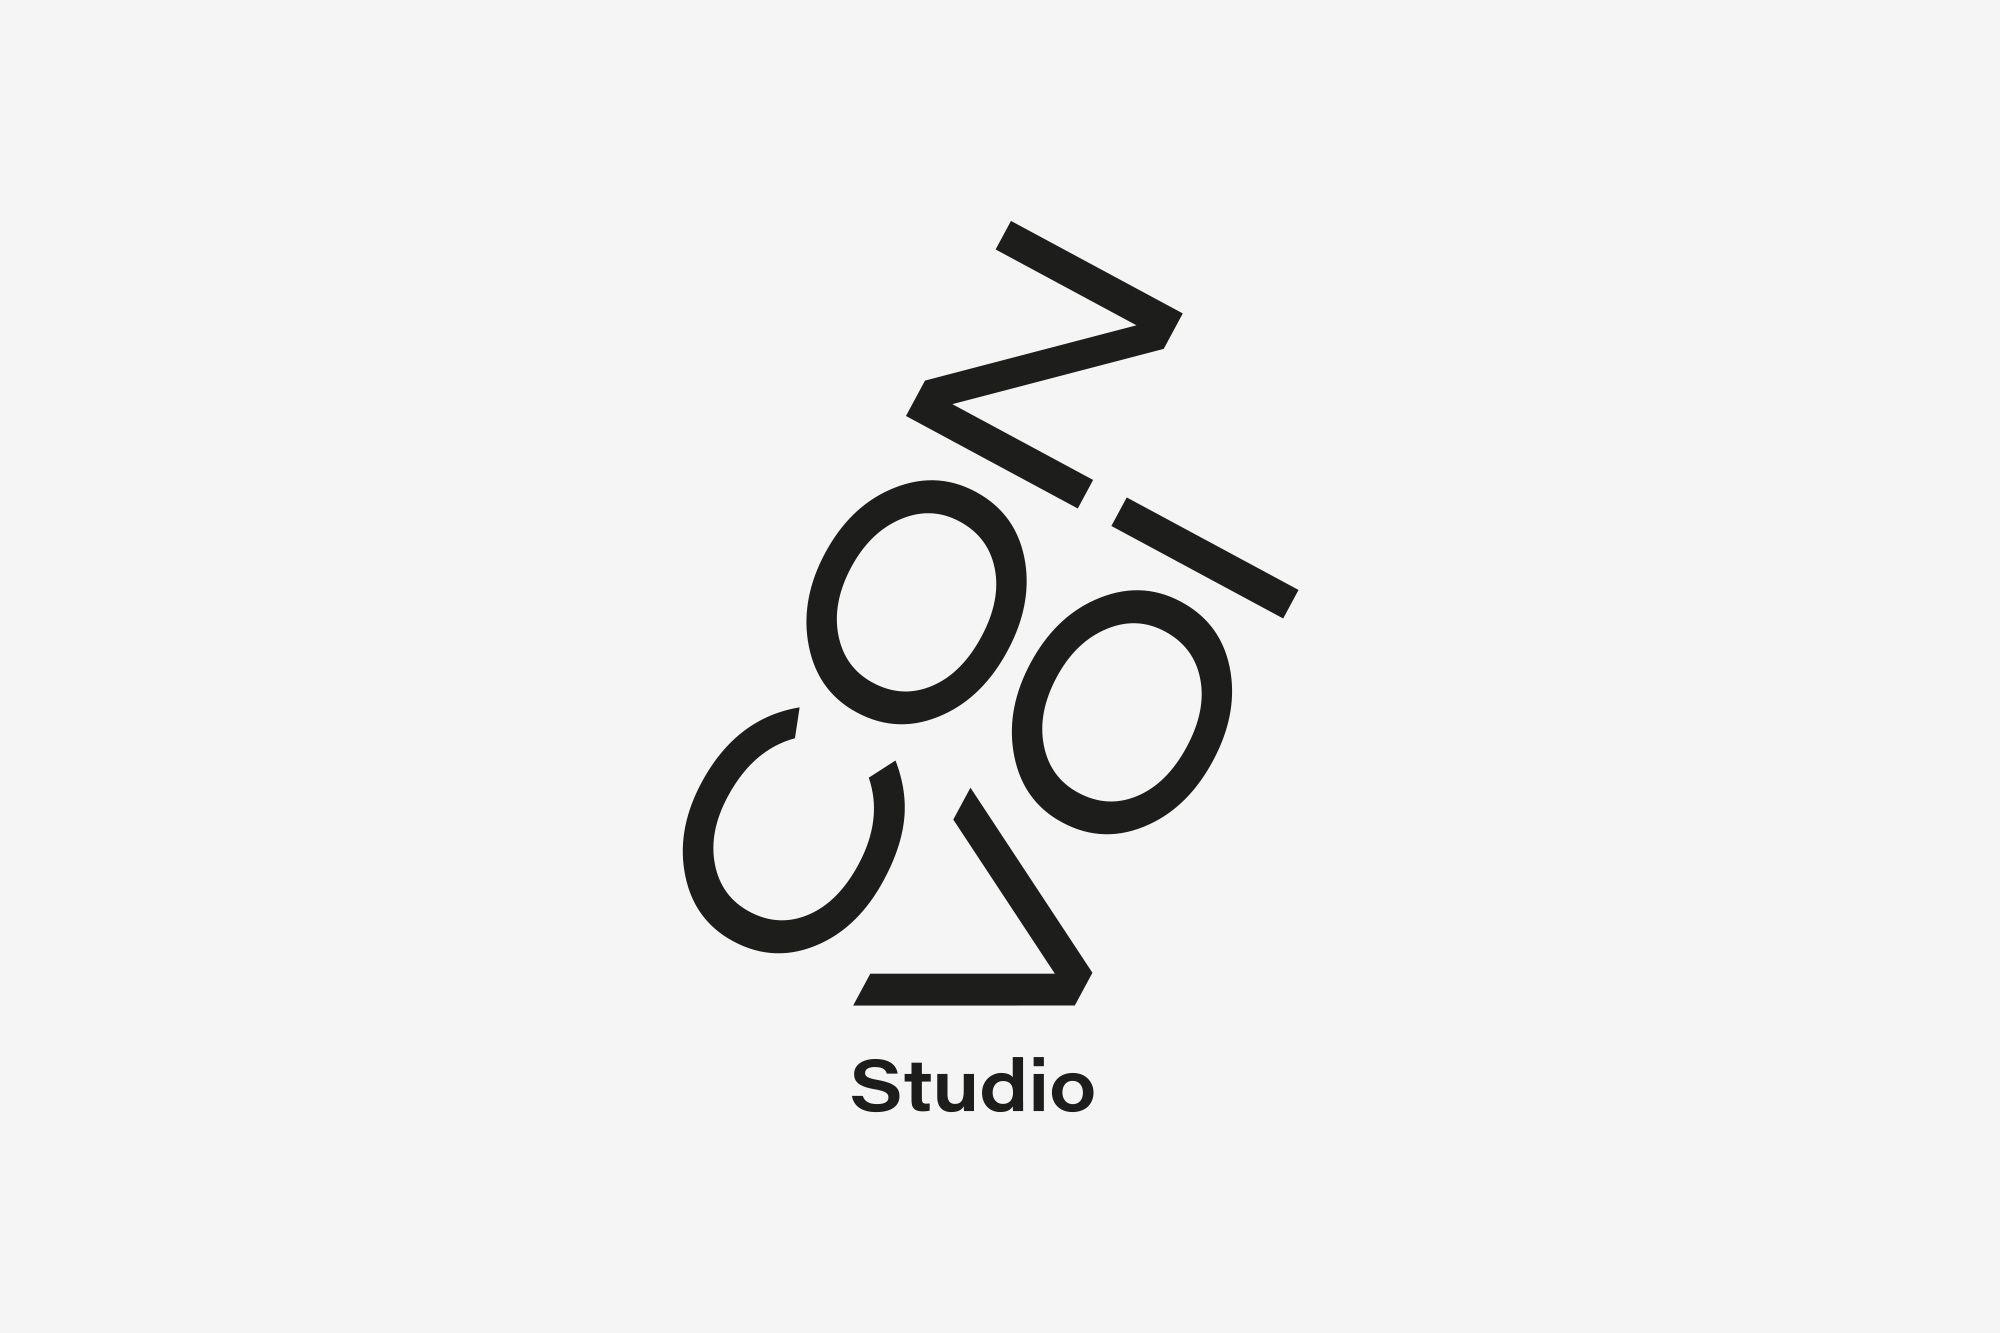 Convoi Studio Black